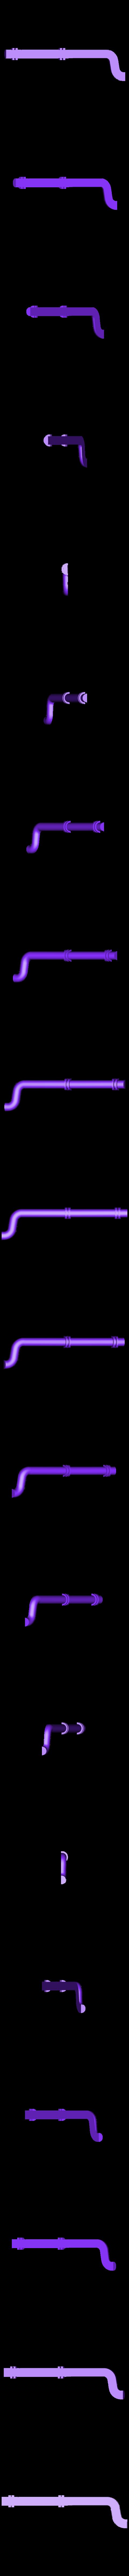 MirrorSteam_Pipe_-_Back_Engine-B.STL Download free STL file 4-8-8-4 Big Boy Locomotive • 3D printer object, RaymondDeLuca